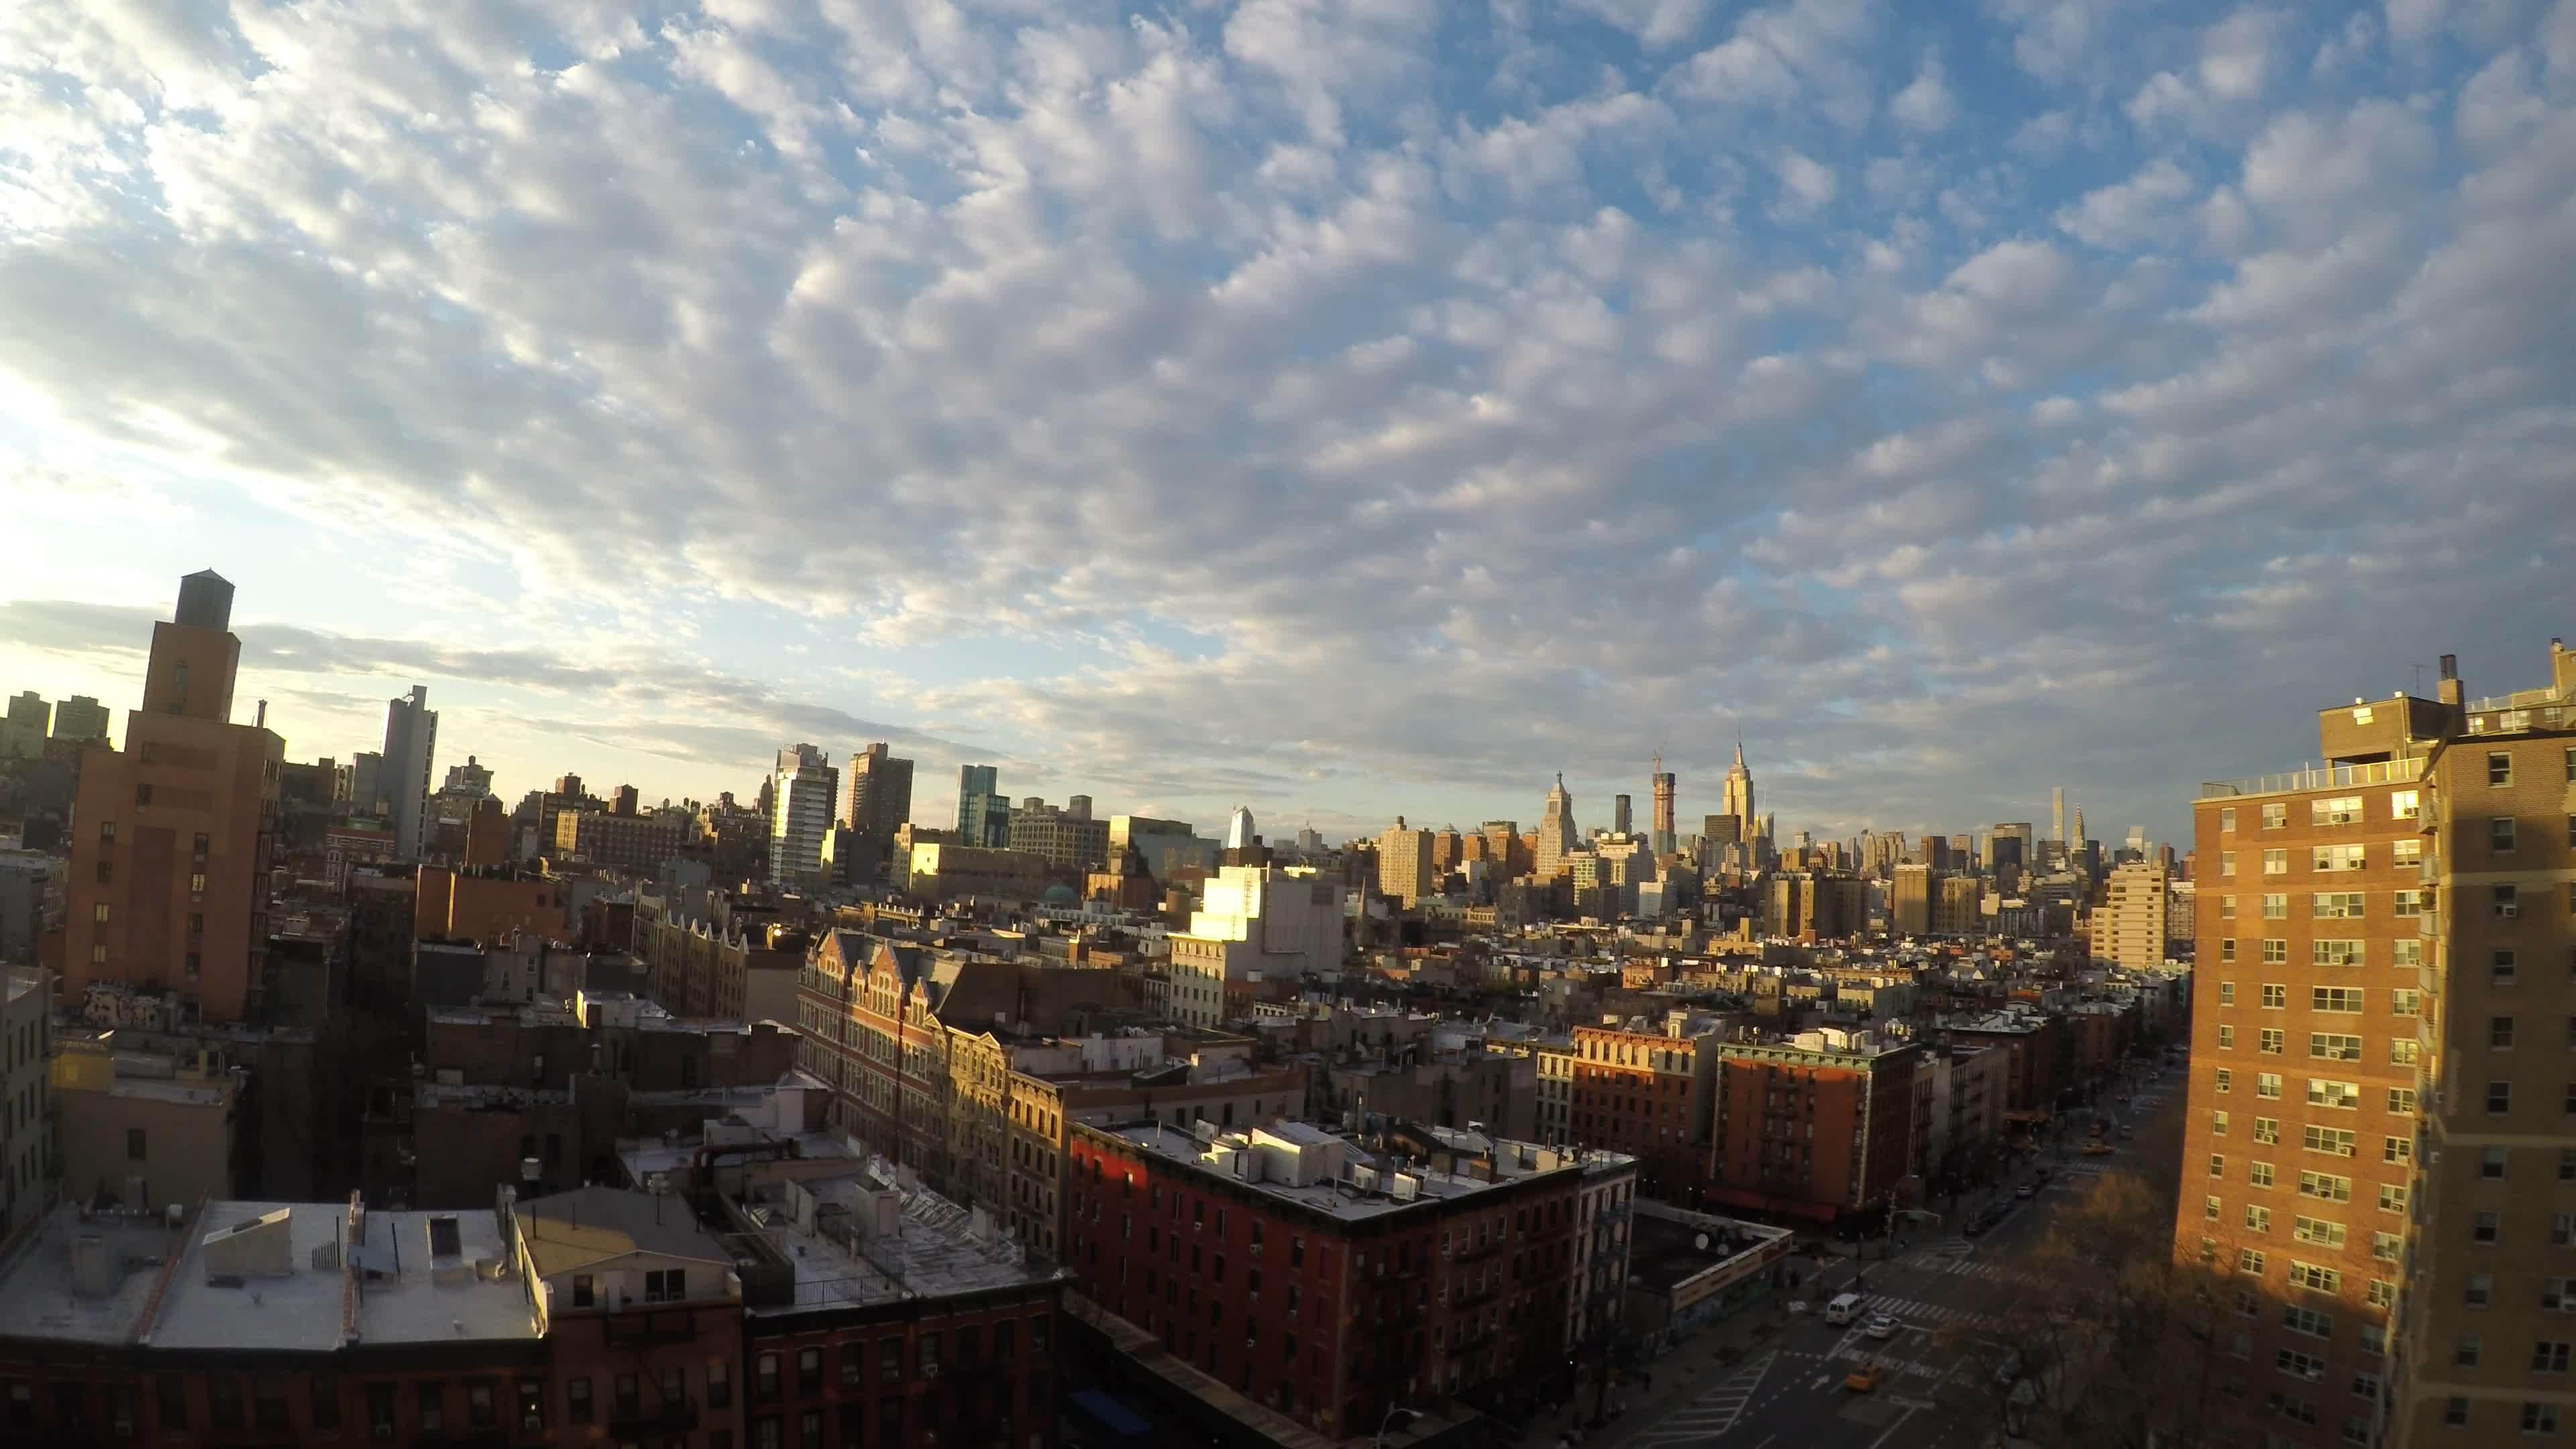 NYC, gopro, timelapse, NYC Timelapse GIFs